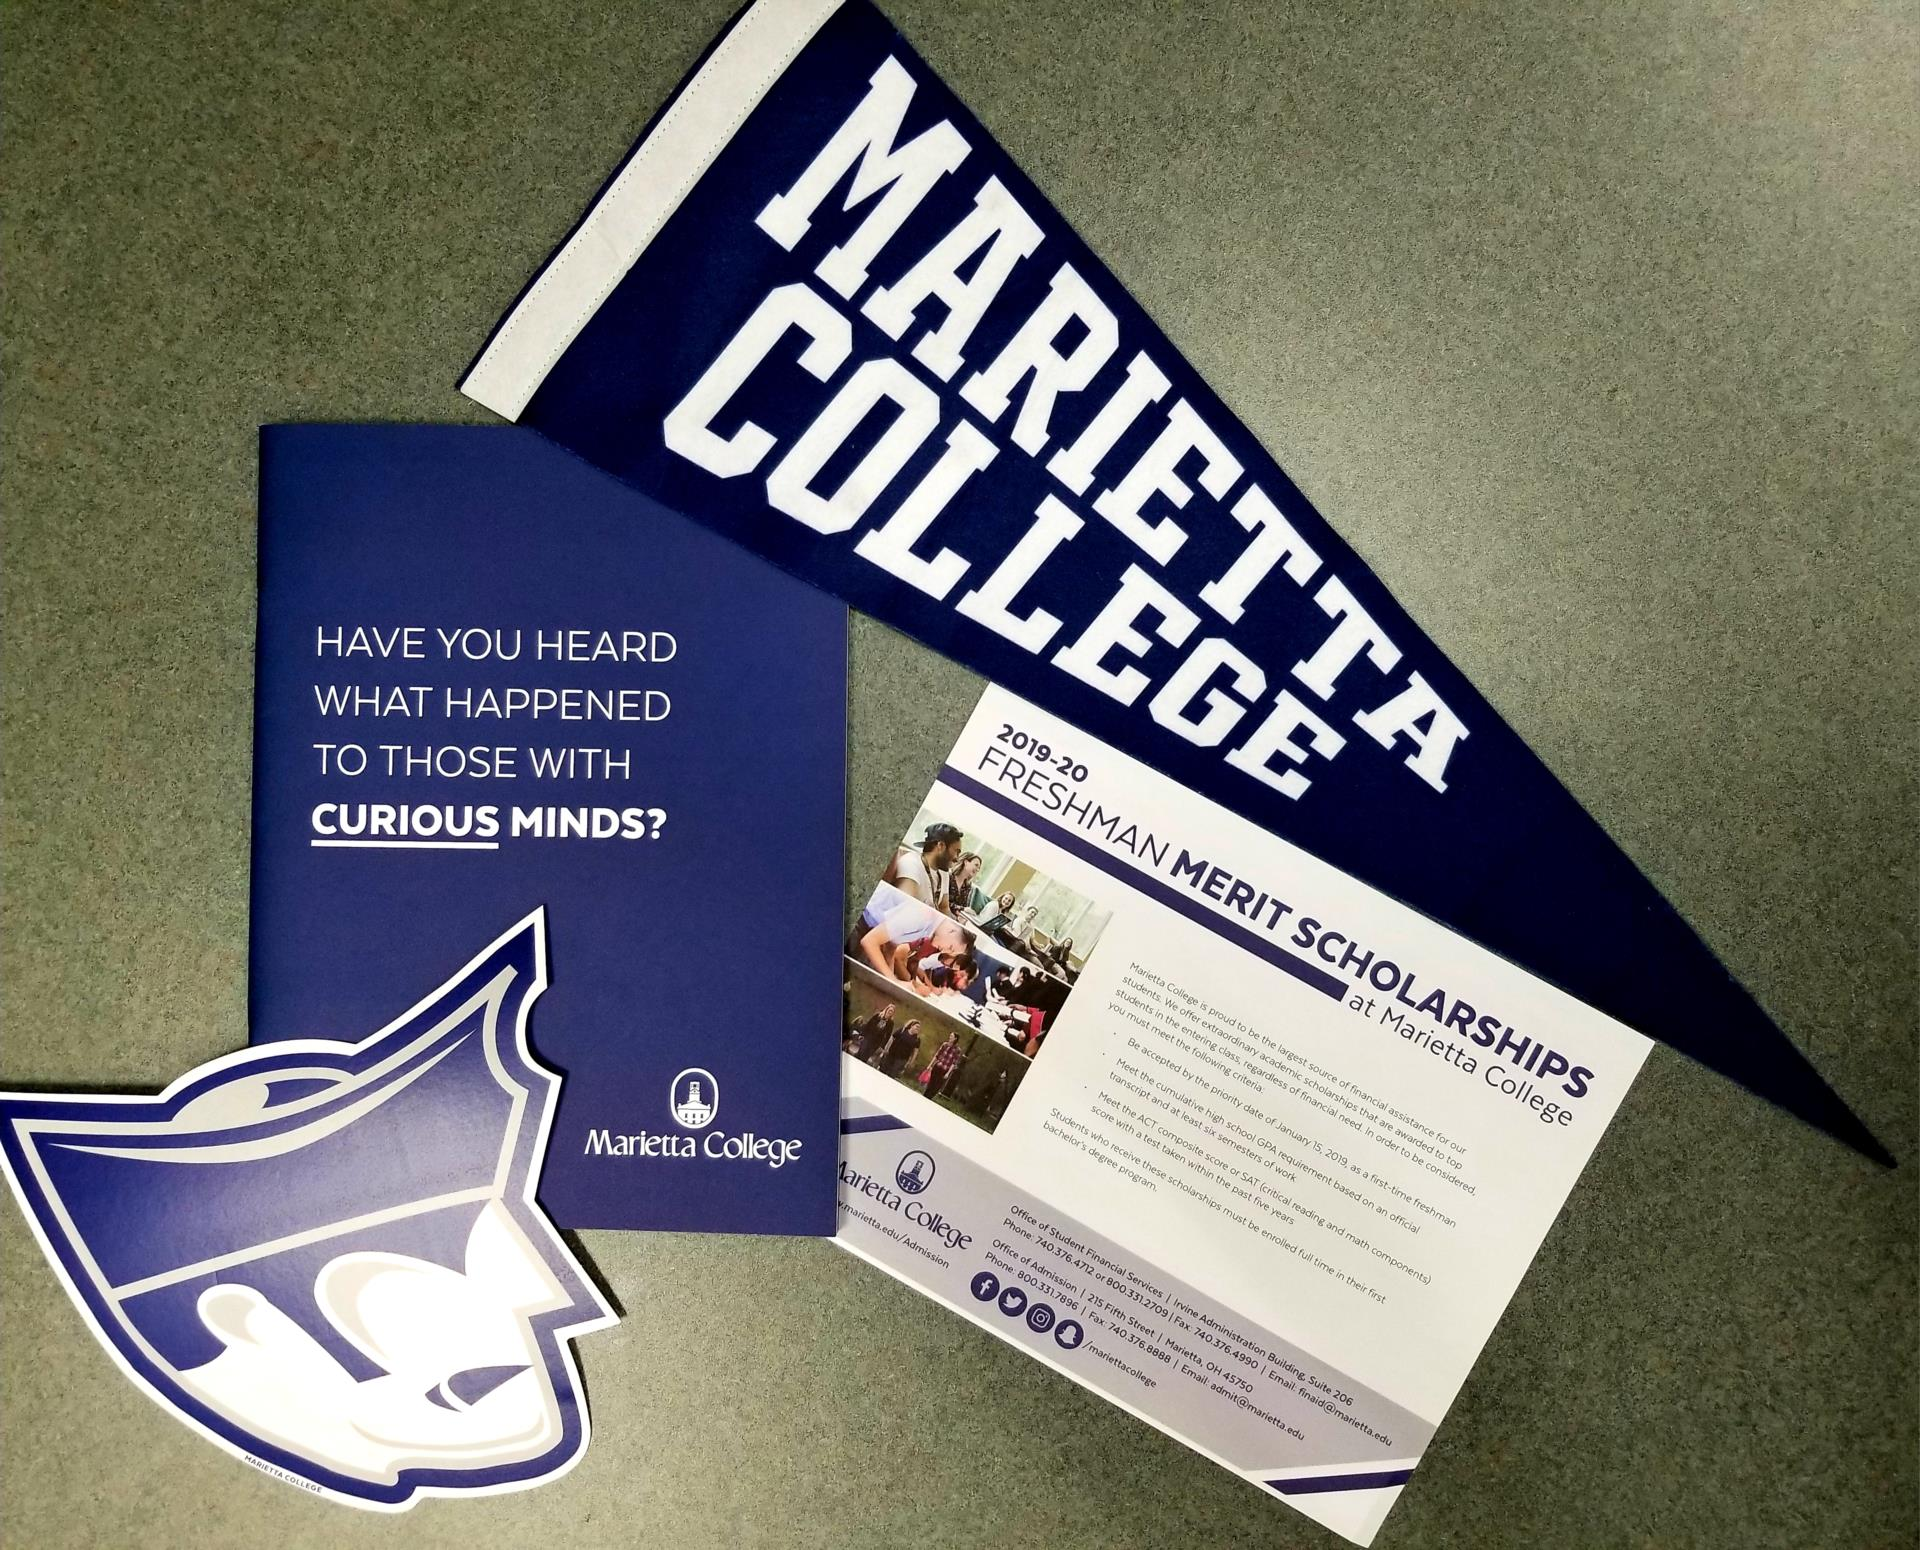 Marietta College Visit